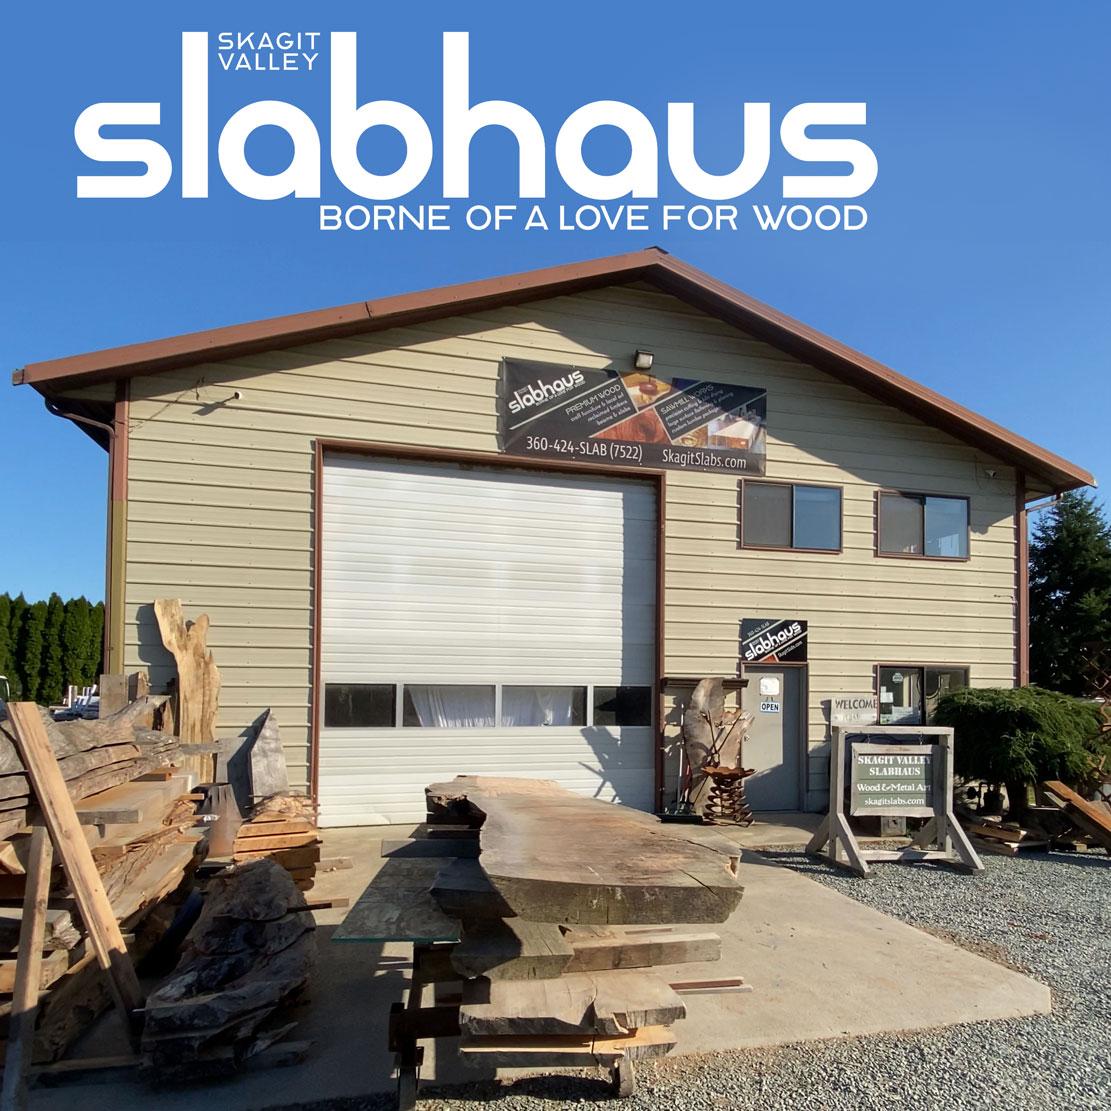 Skagit Valley Slabhaus